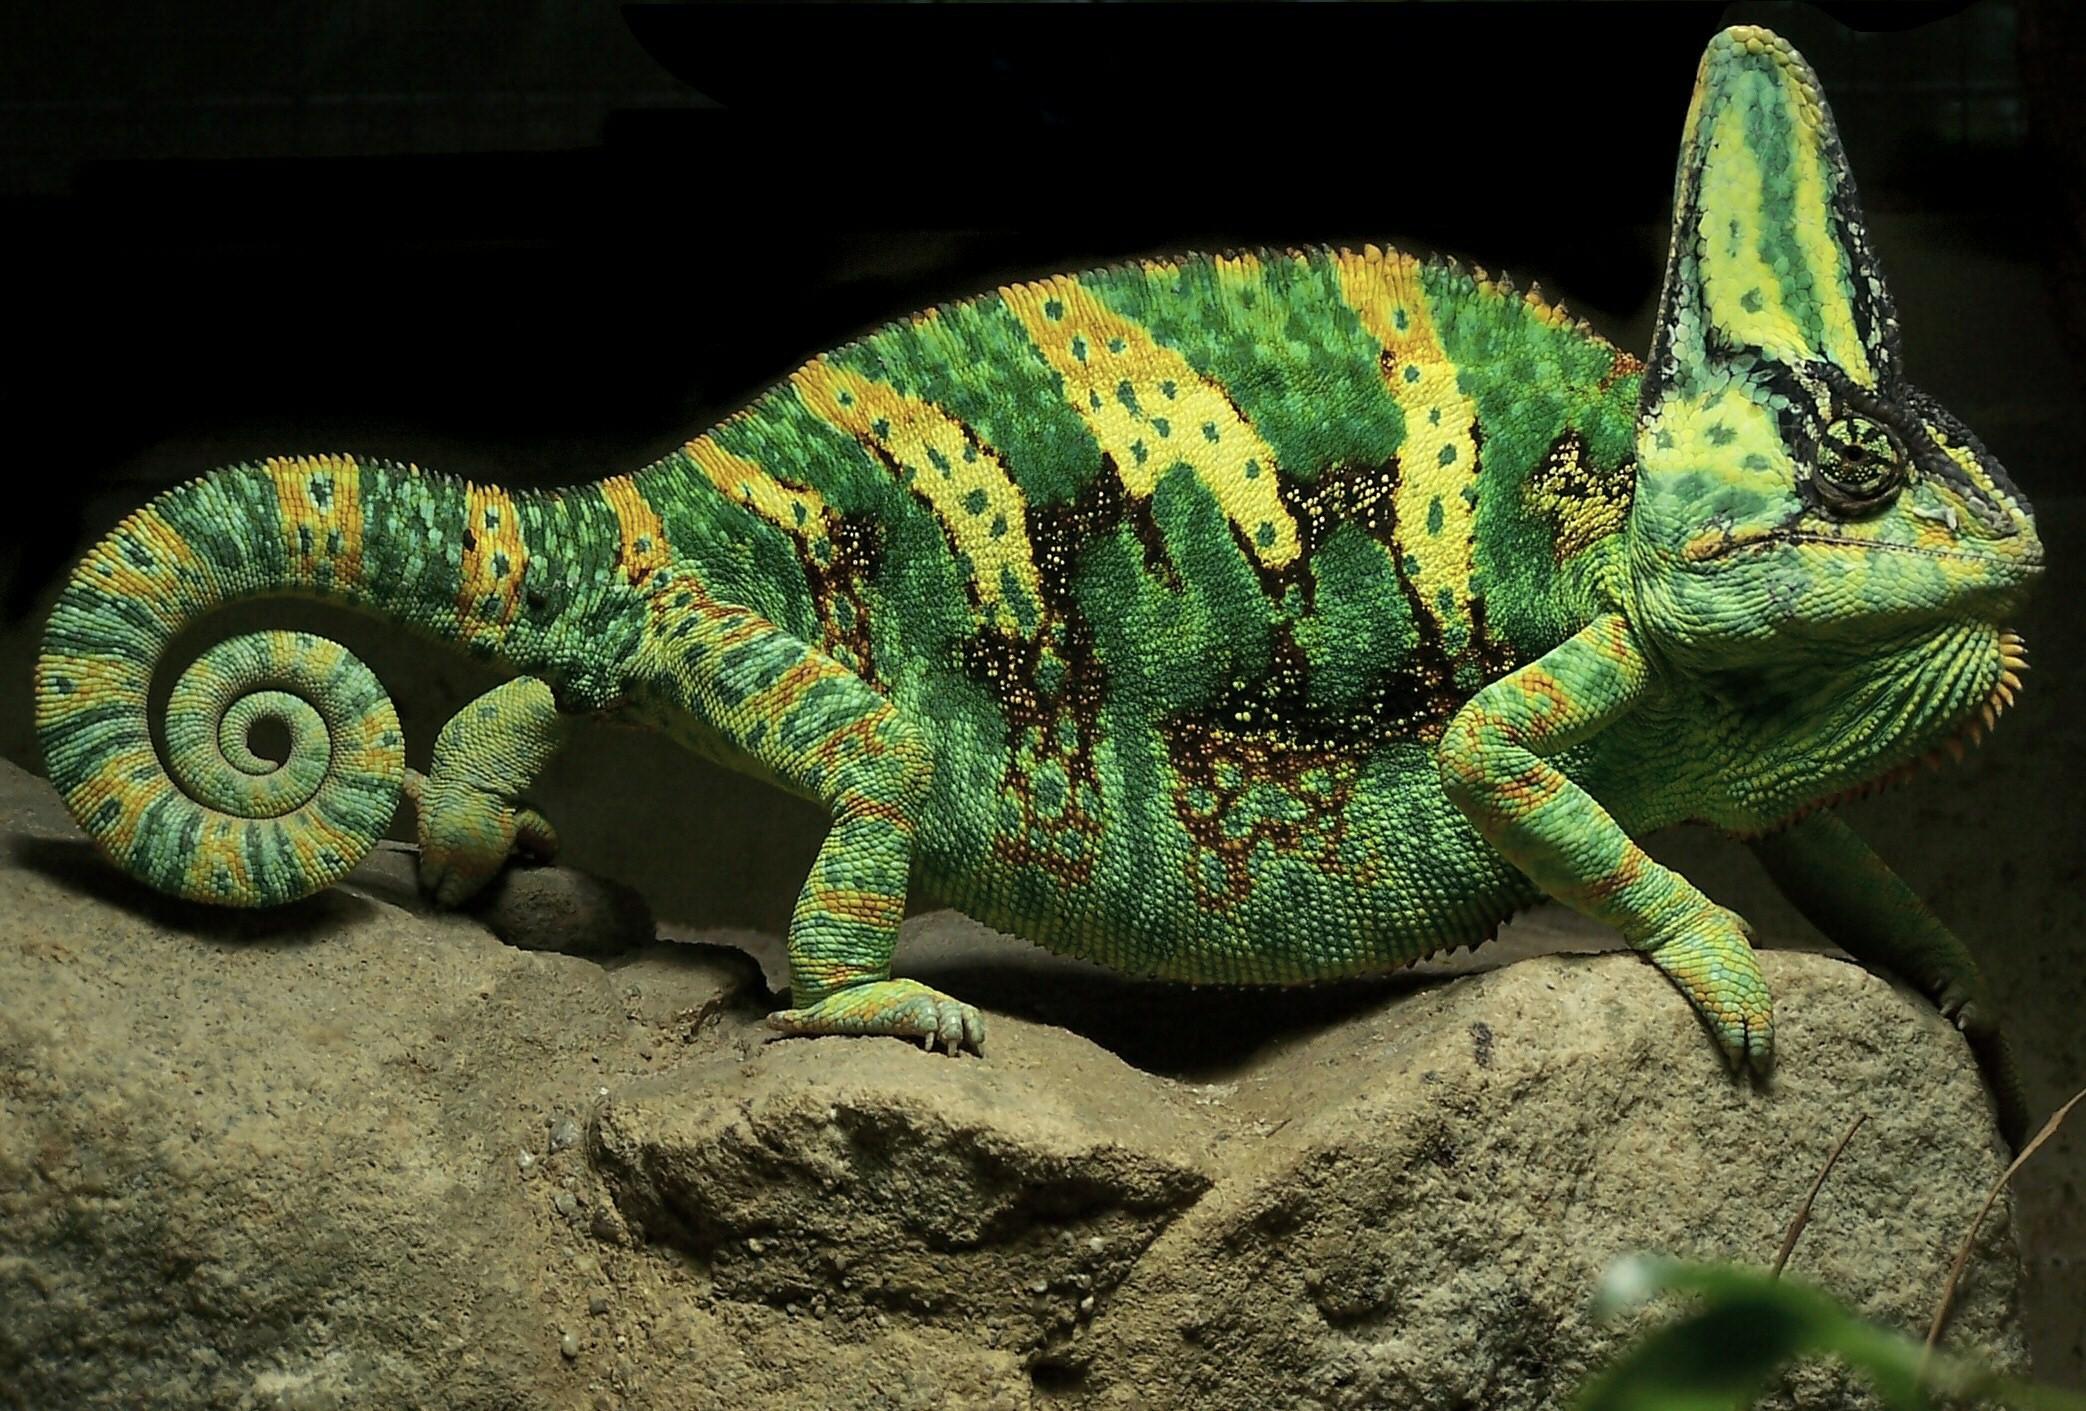 Yemen_Chameleon_(cropped)